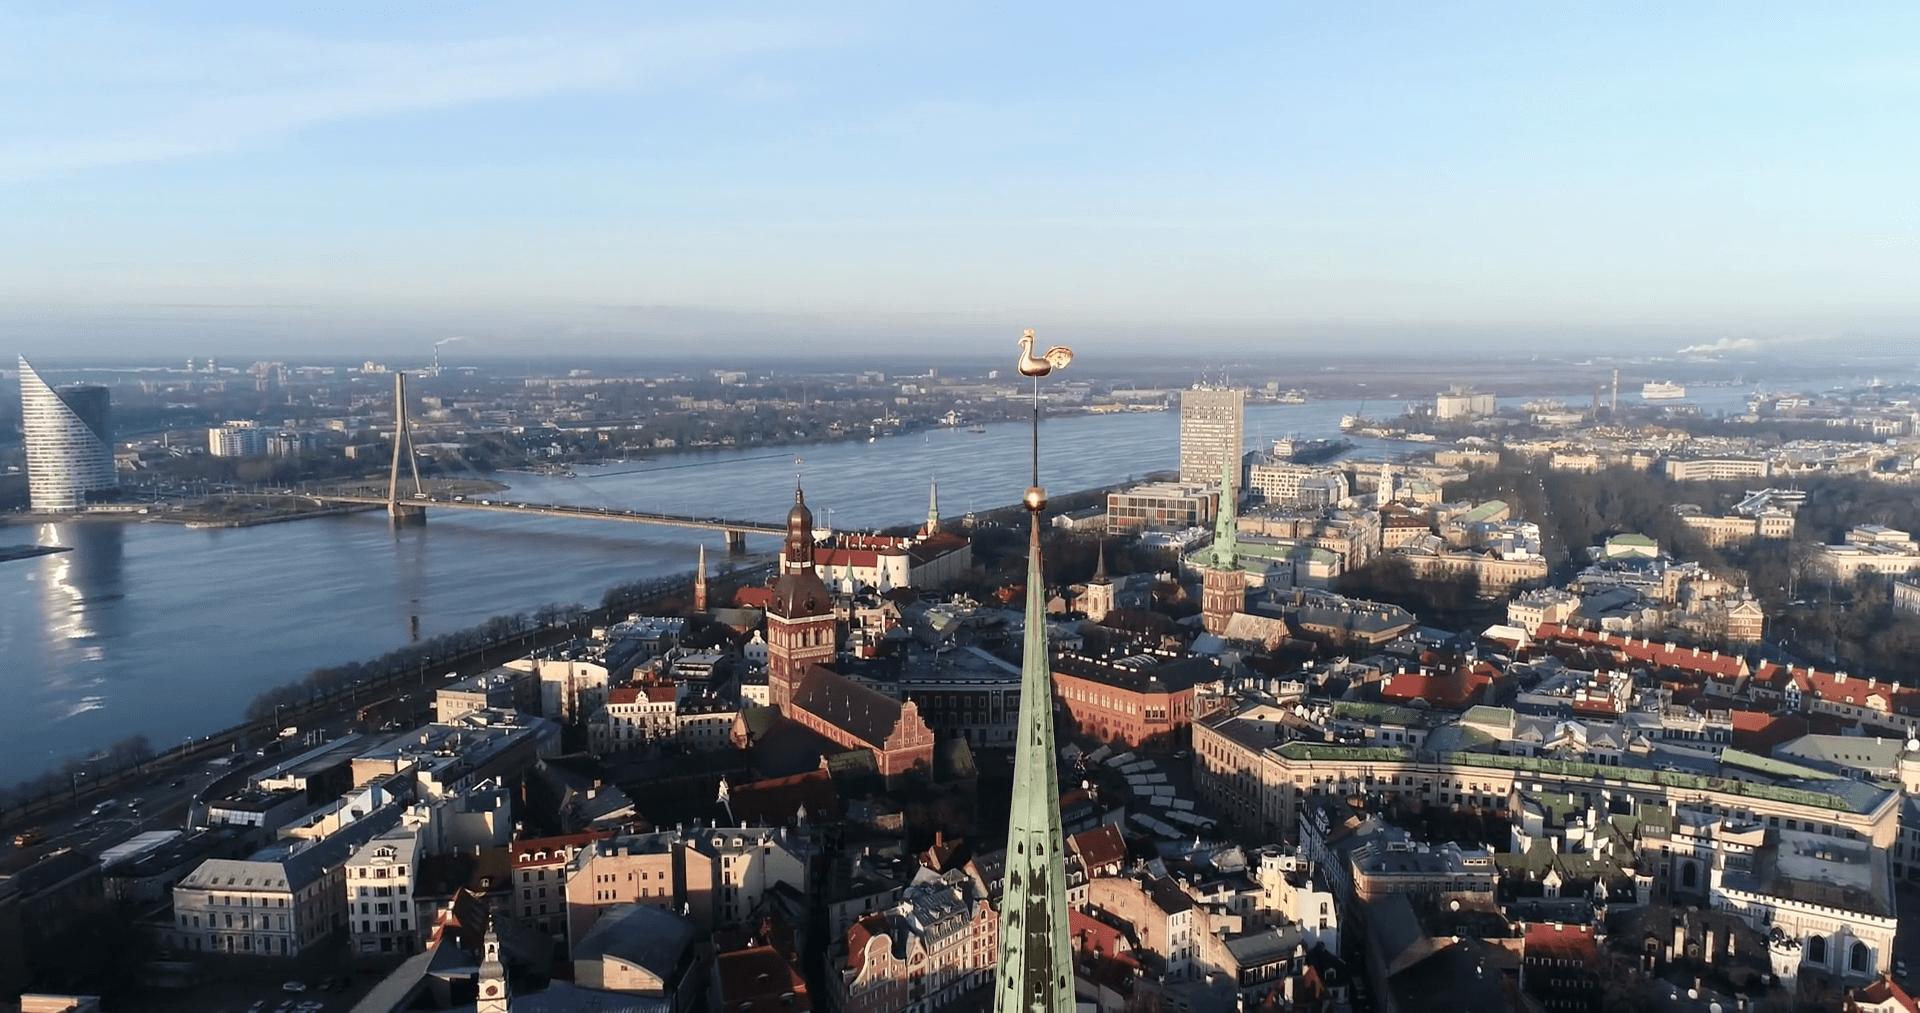 Juliette Alban-Metcalfe will be speaking at EAWOP WorkLab in Riga, Latvia